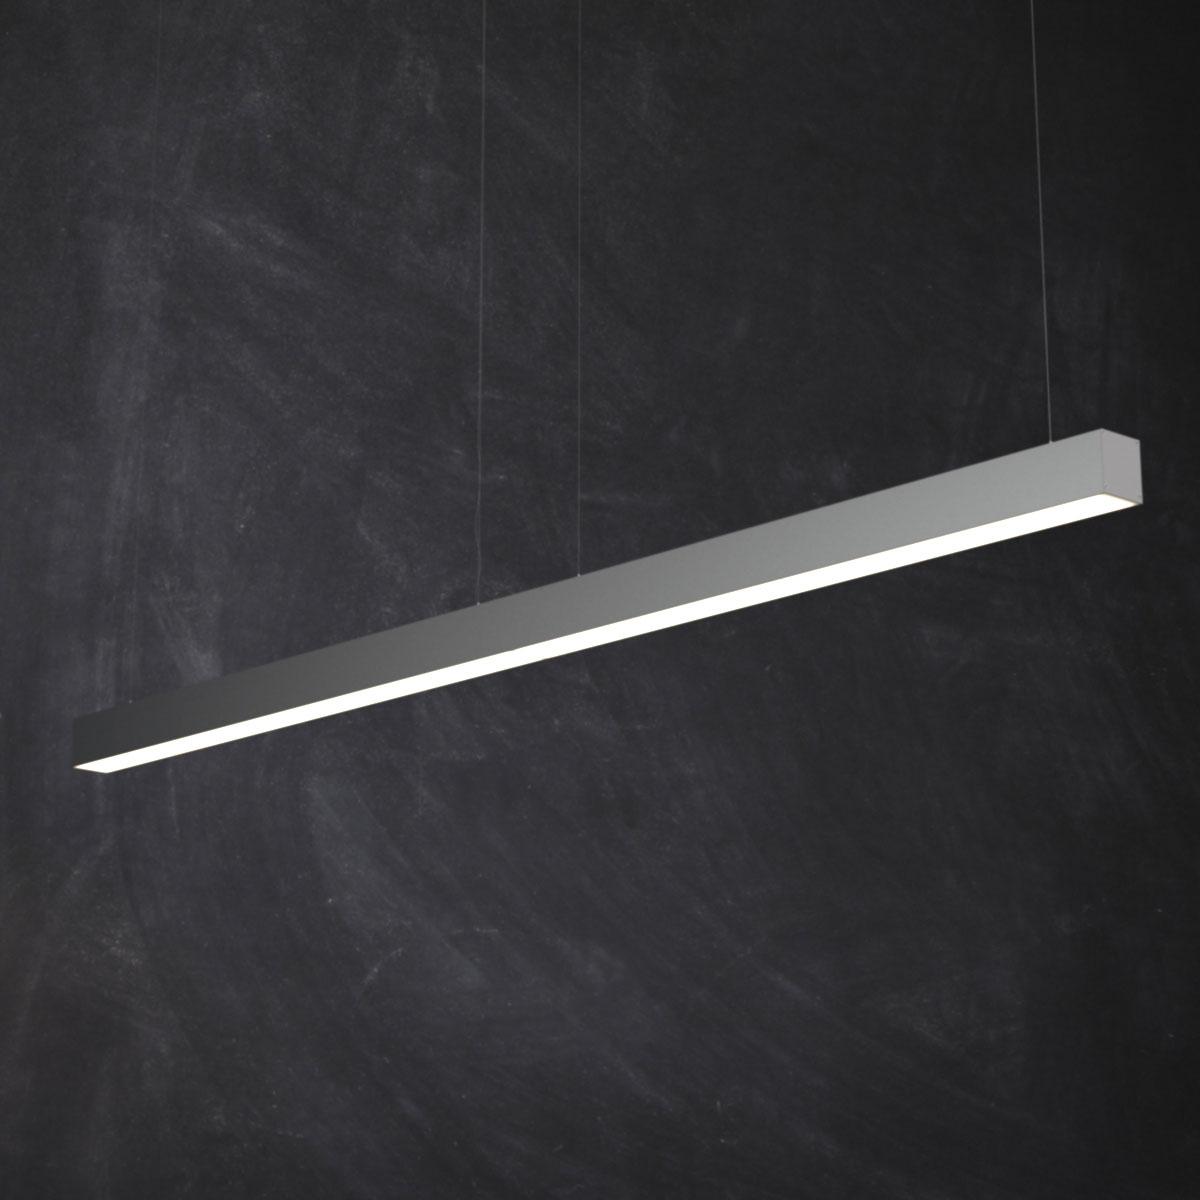 lamp 68 AM152 Archmodels